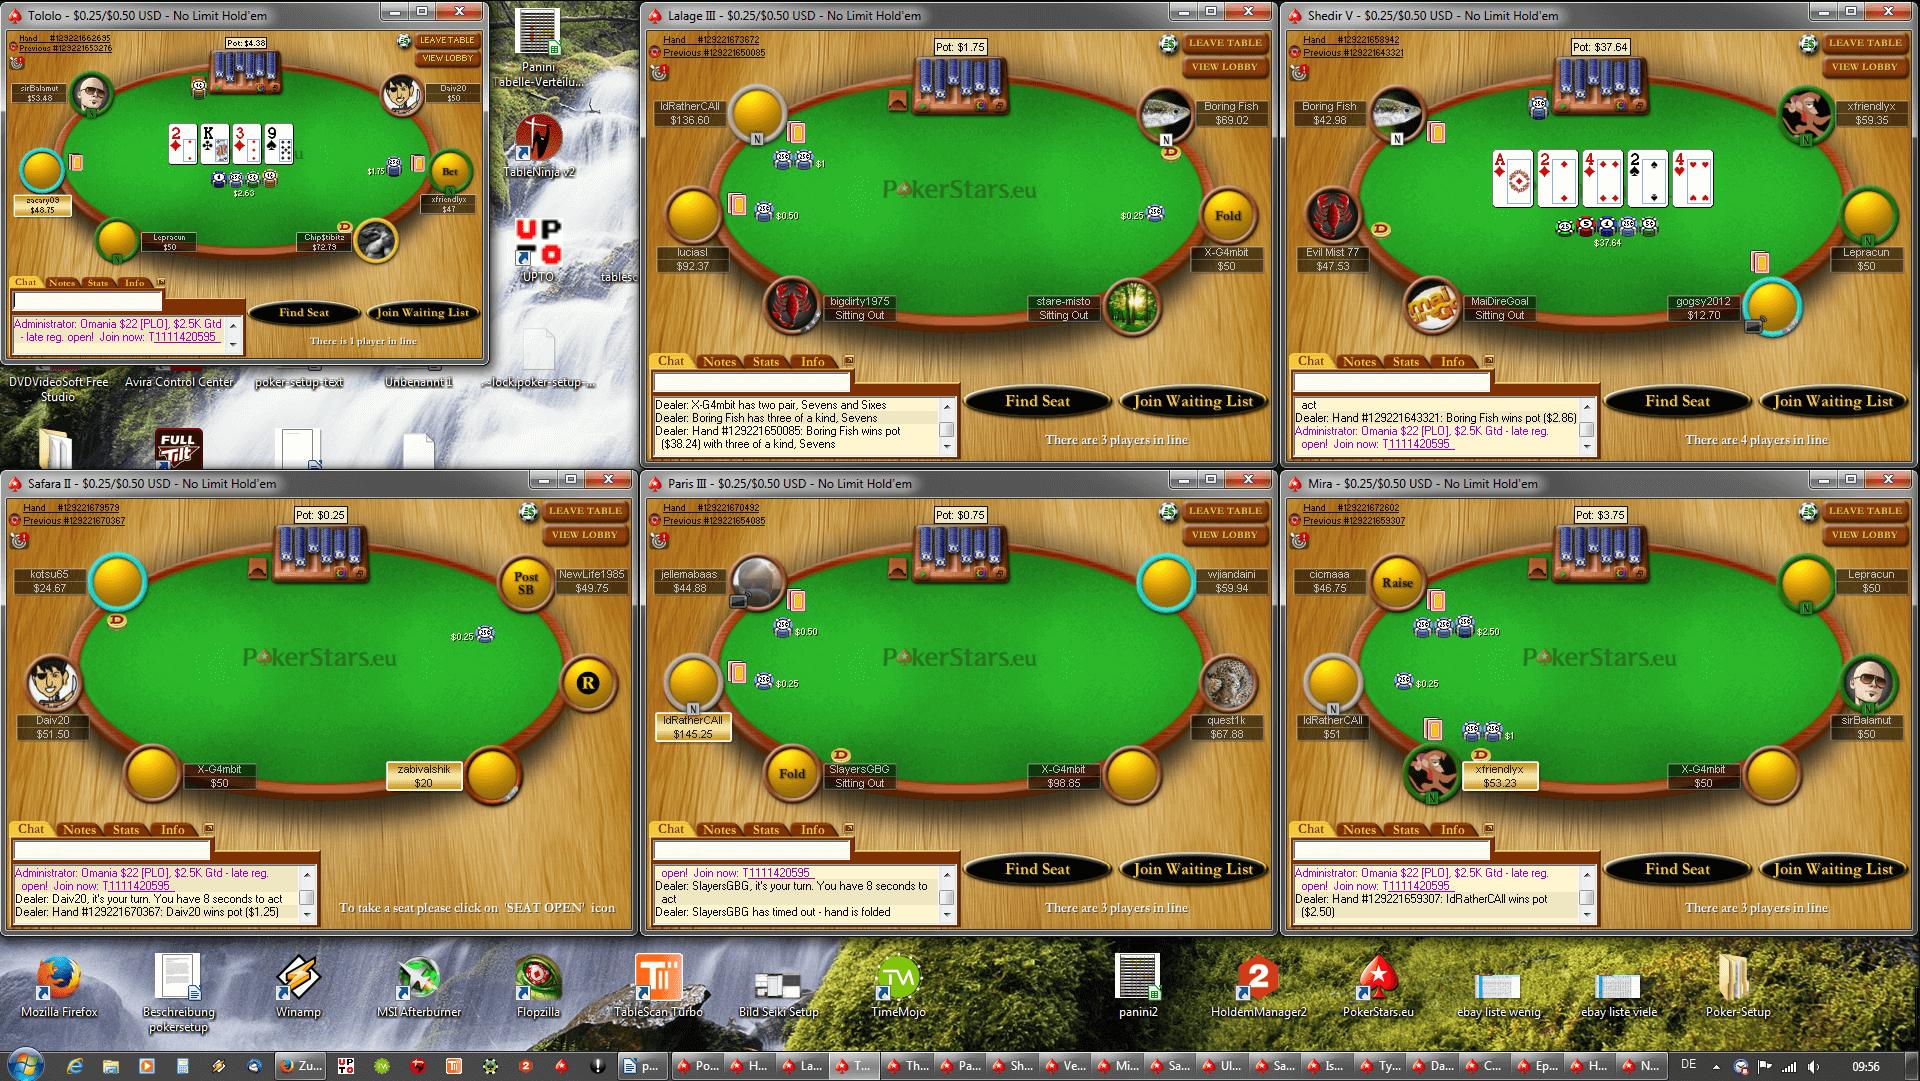 Tischanordnung Poker - FullHD(3x2)